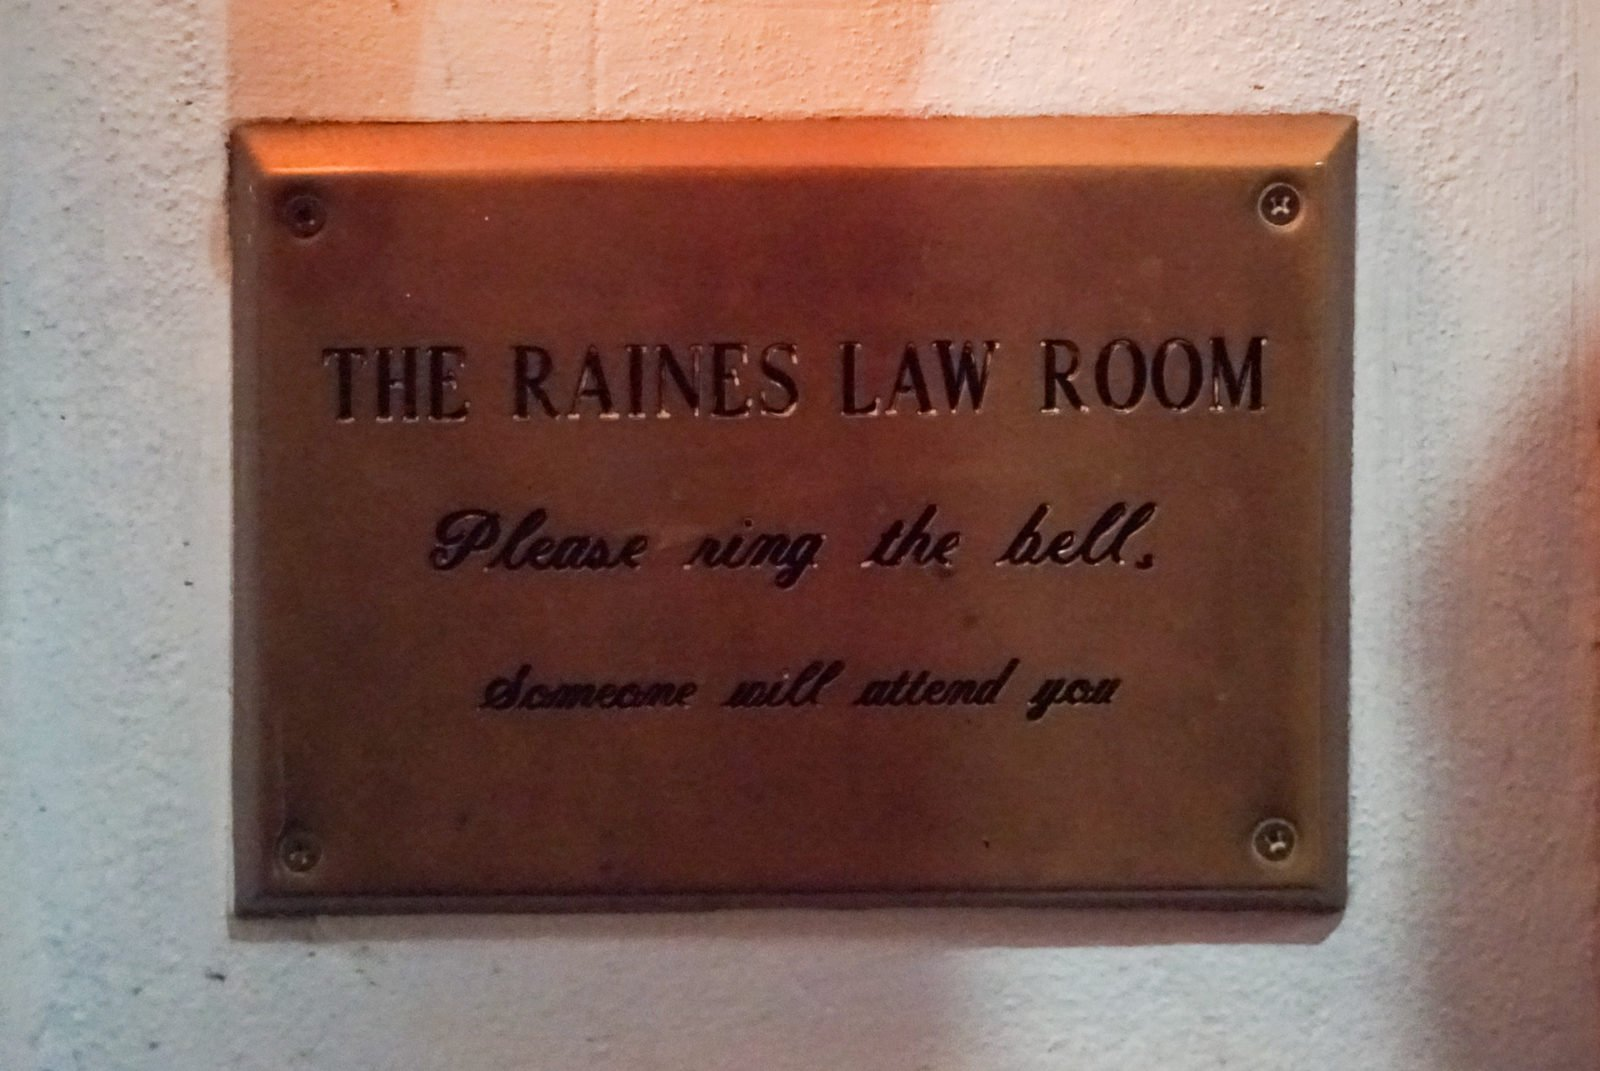 Raines Law Room New York City Secret Bar entrance sign